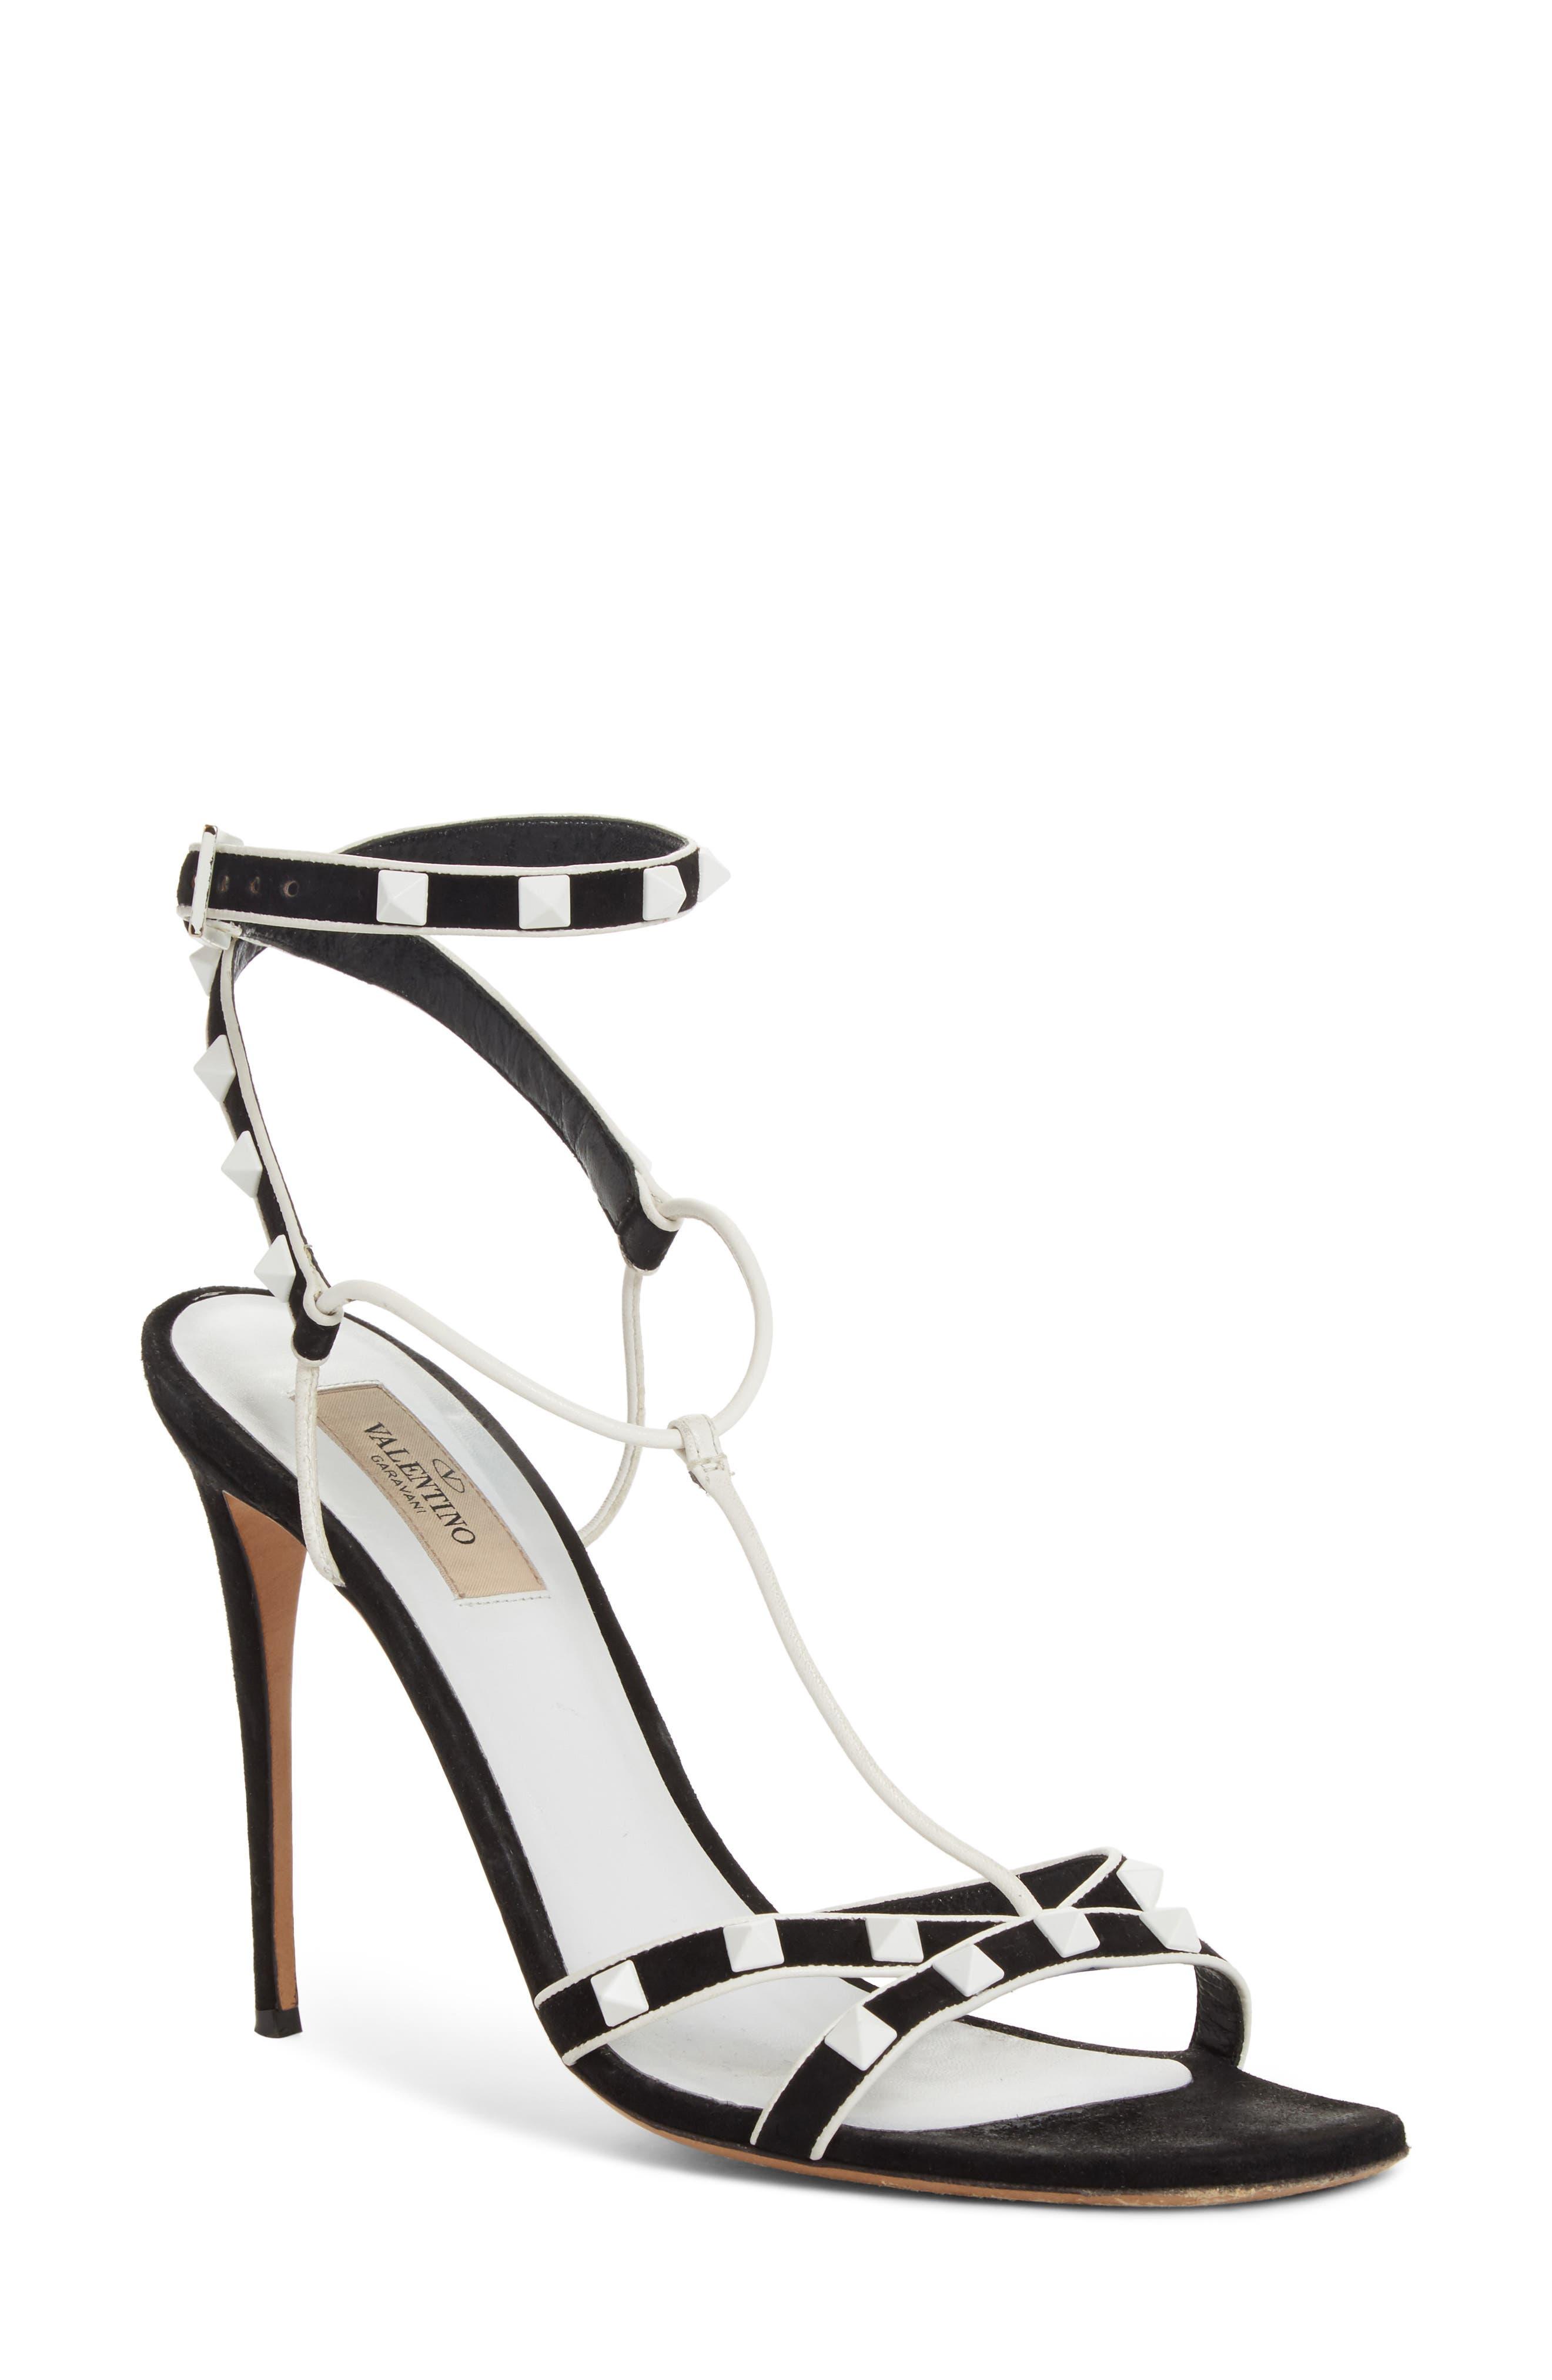 Valentino Free Rockstud T-Strap Sandal,                         Main,                         color, Black/ White